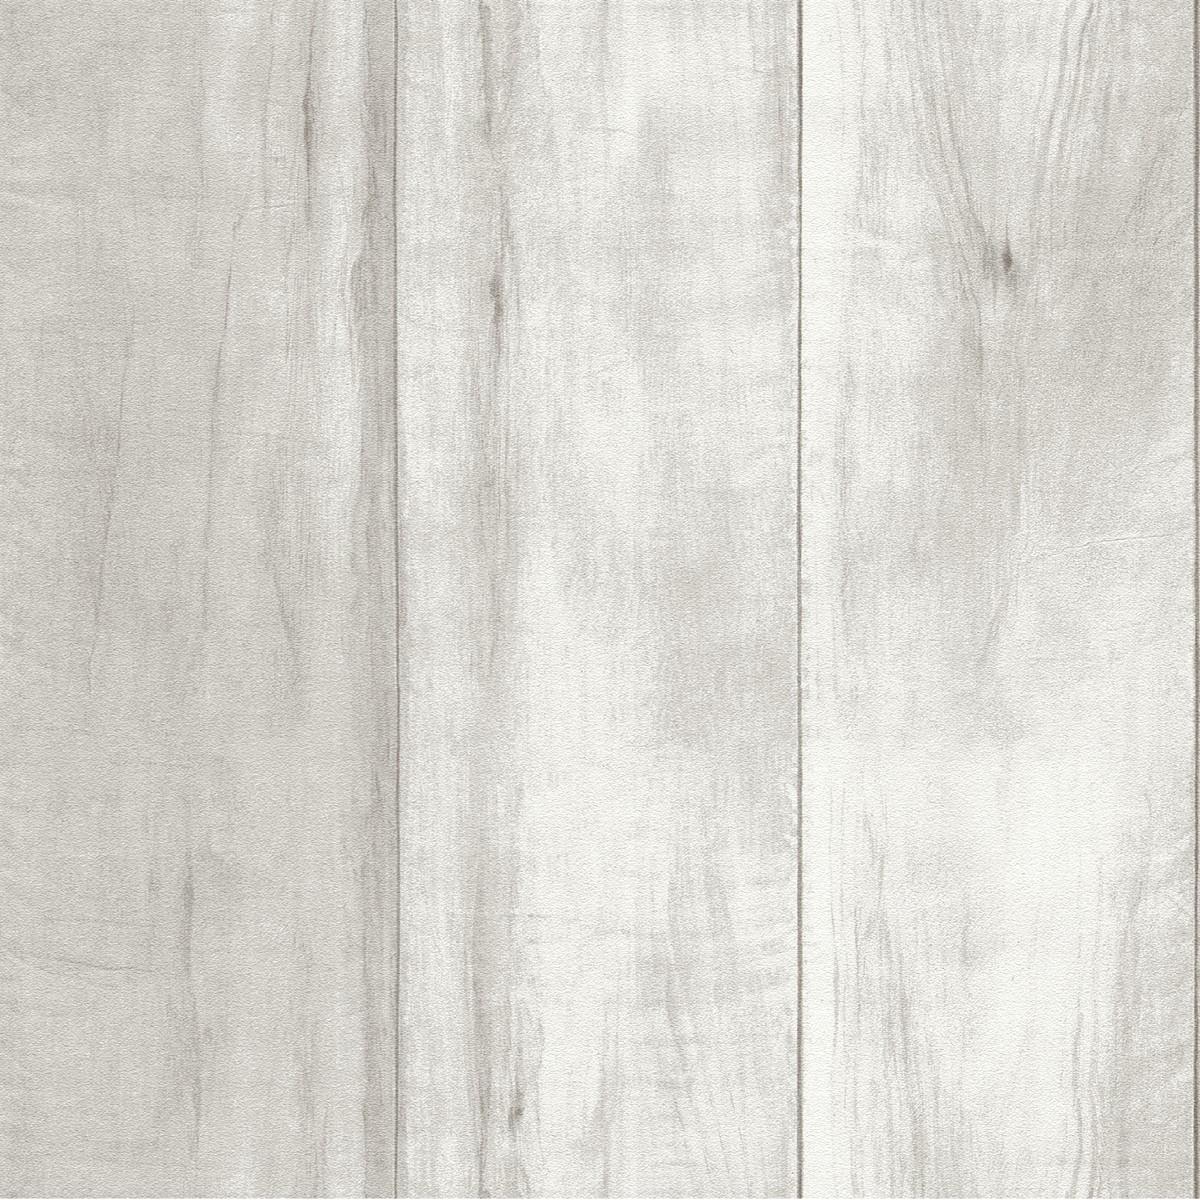 Papel de parede madeira cinza 1424 wp decor elo7 for Papel de pared rustico